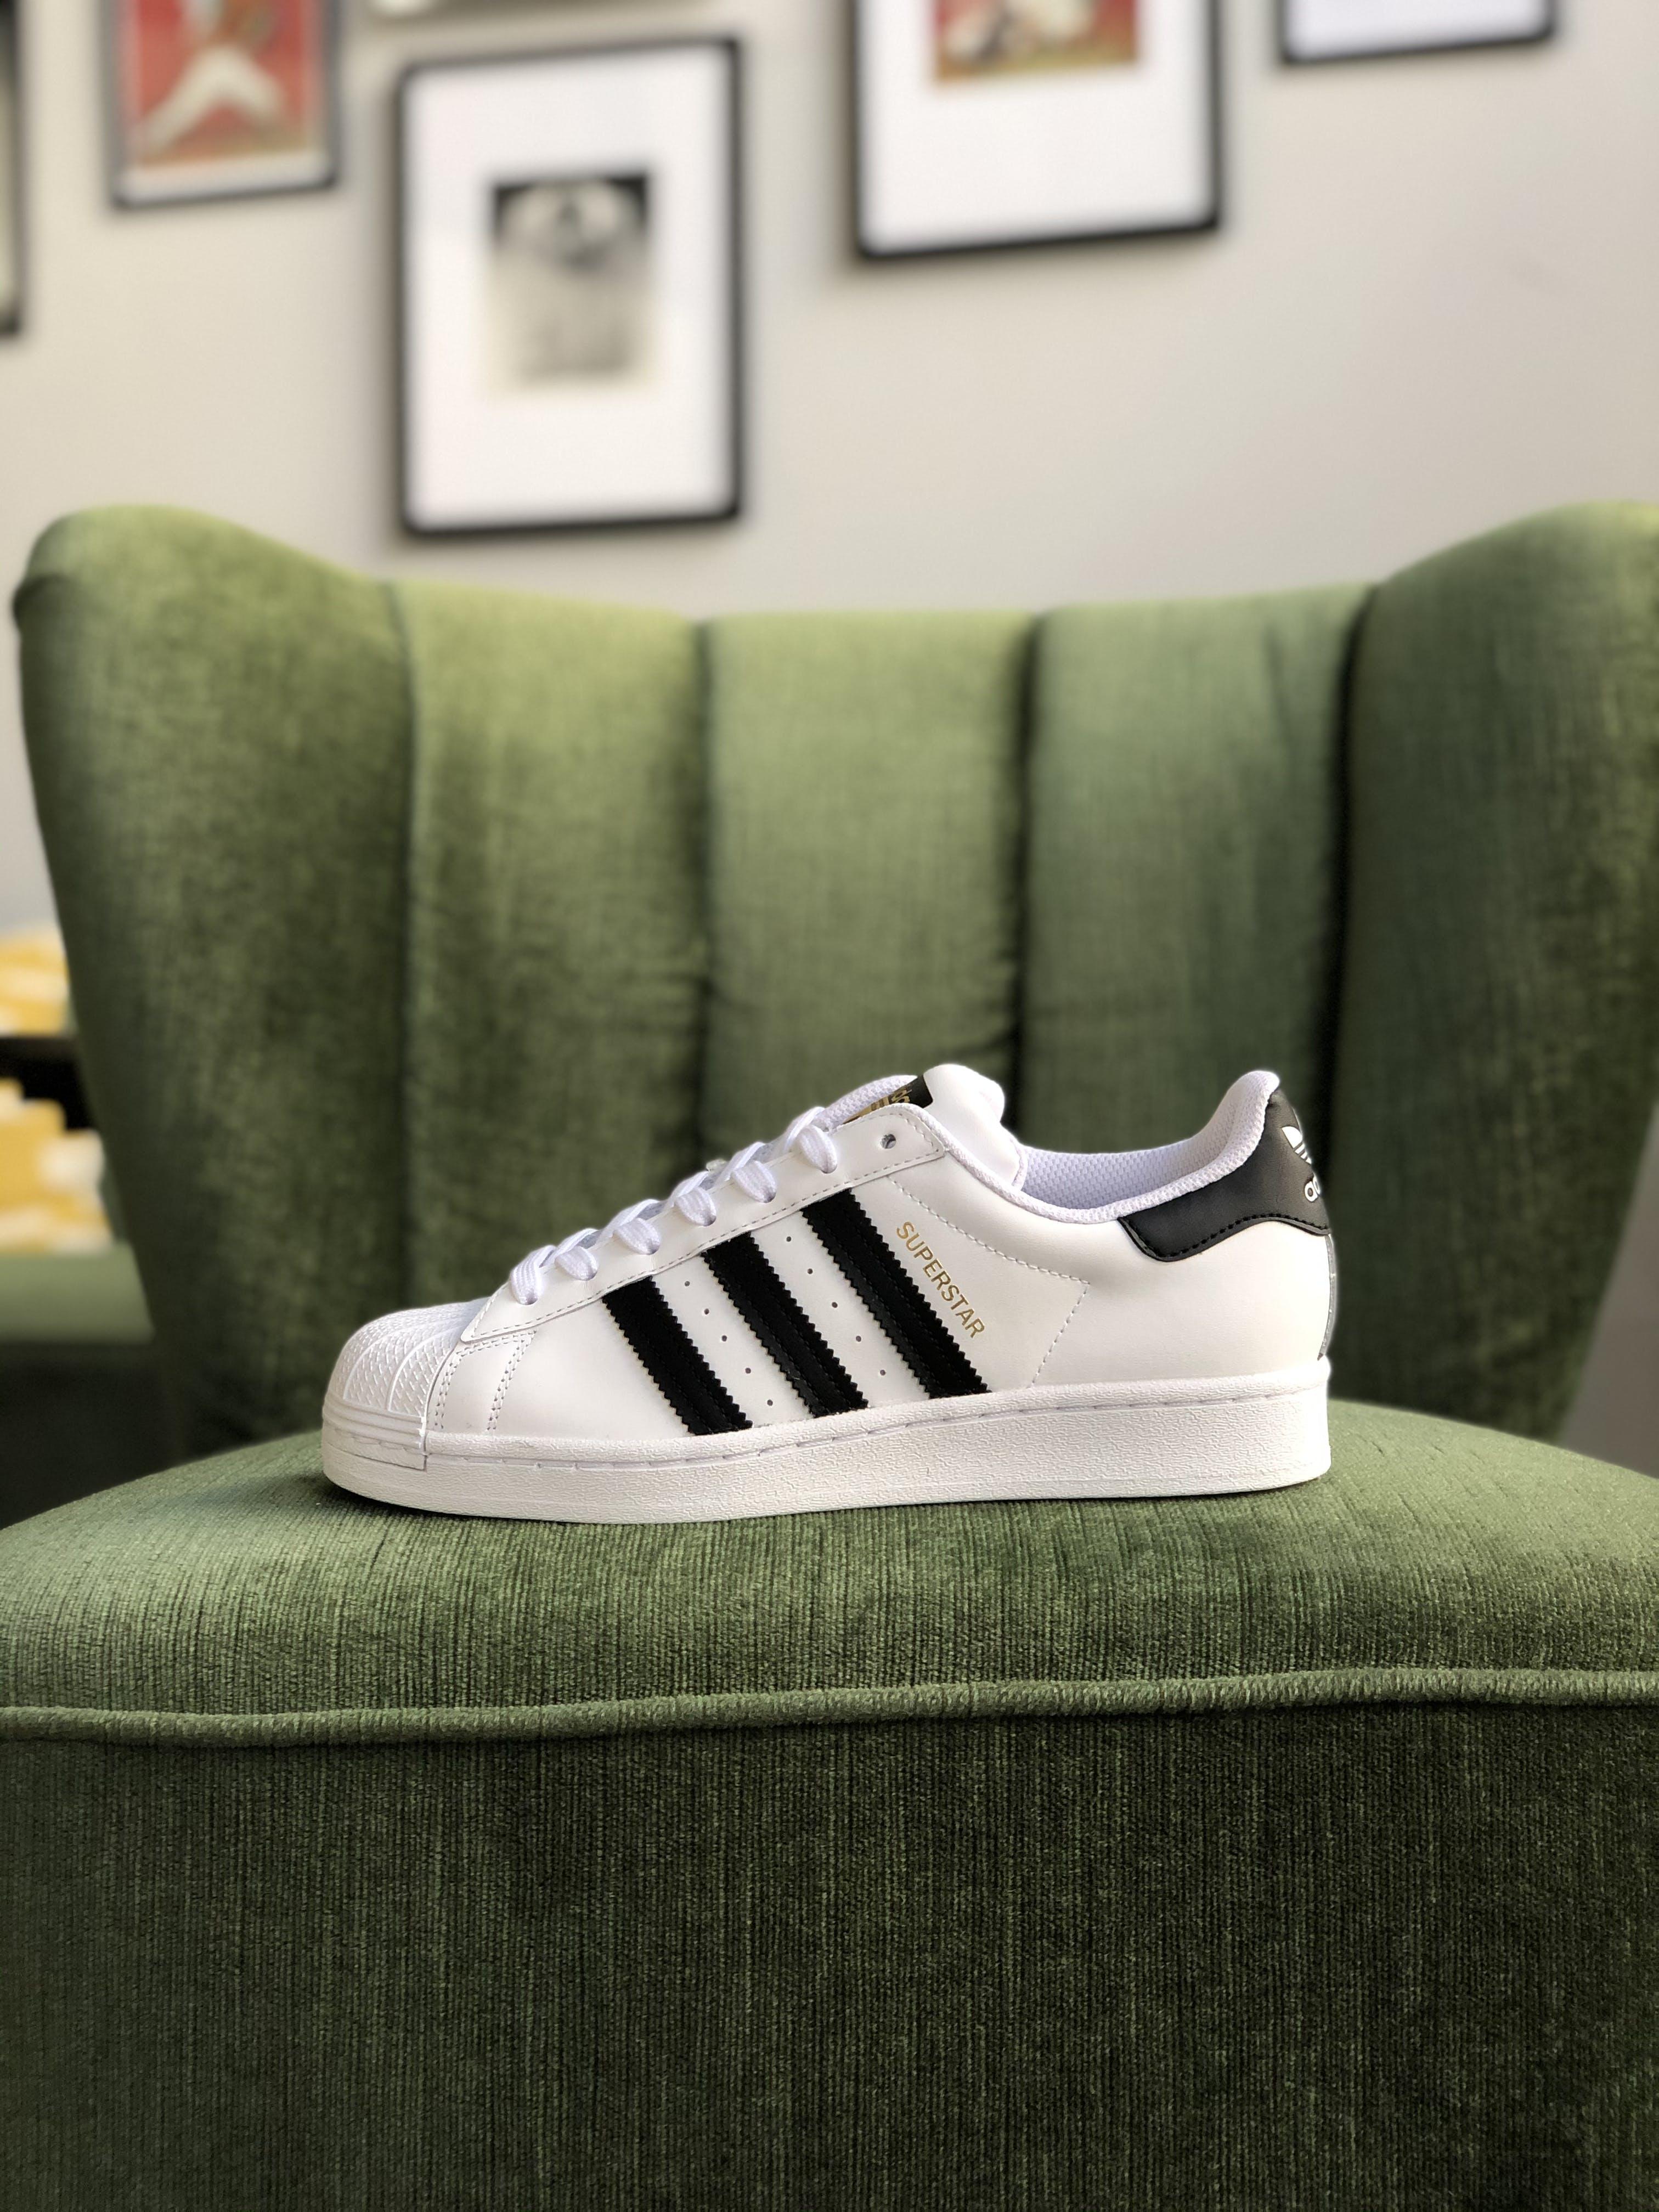 adidas Superstar - Sizerun 36 - 46